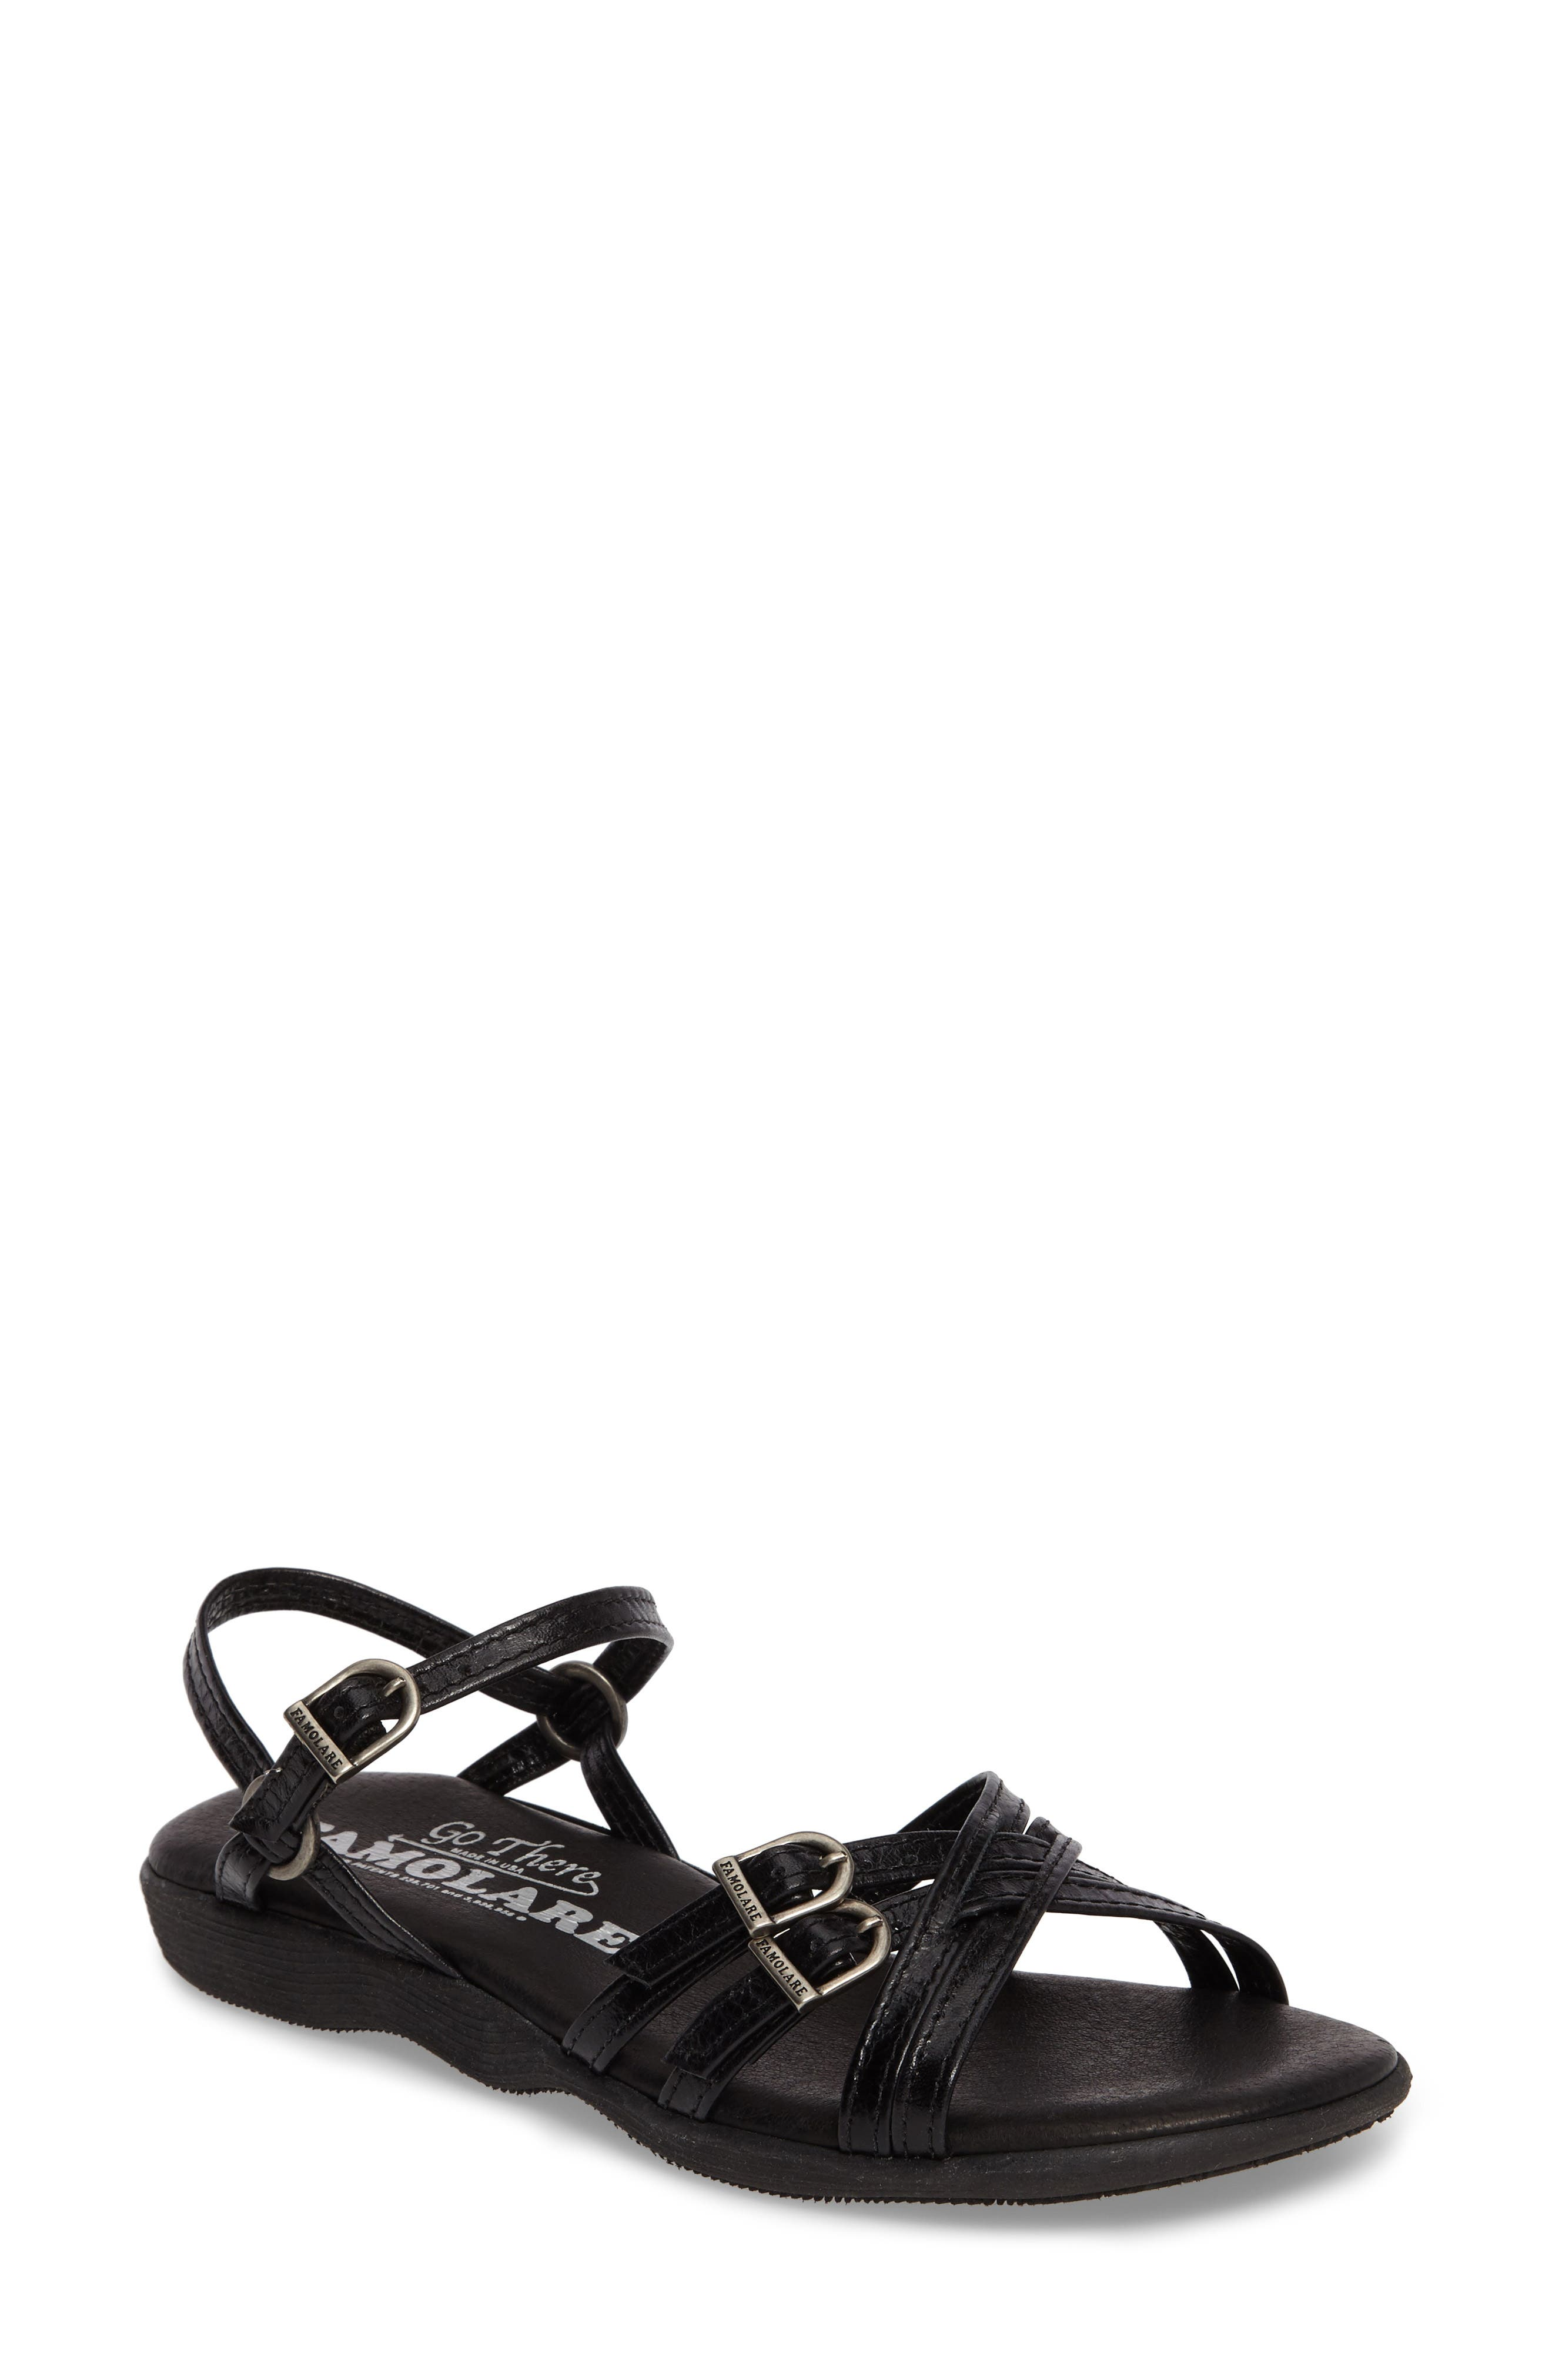 Strapsody Buckle Sandal,                             Main thumbnail 1, color,                             Coal Leather